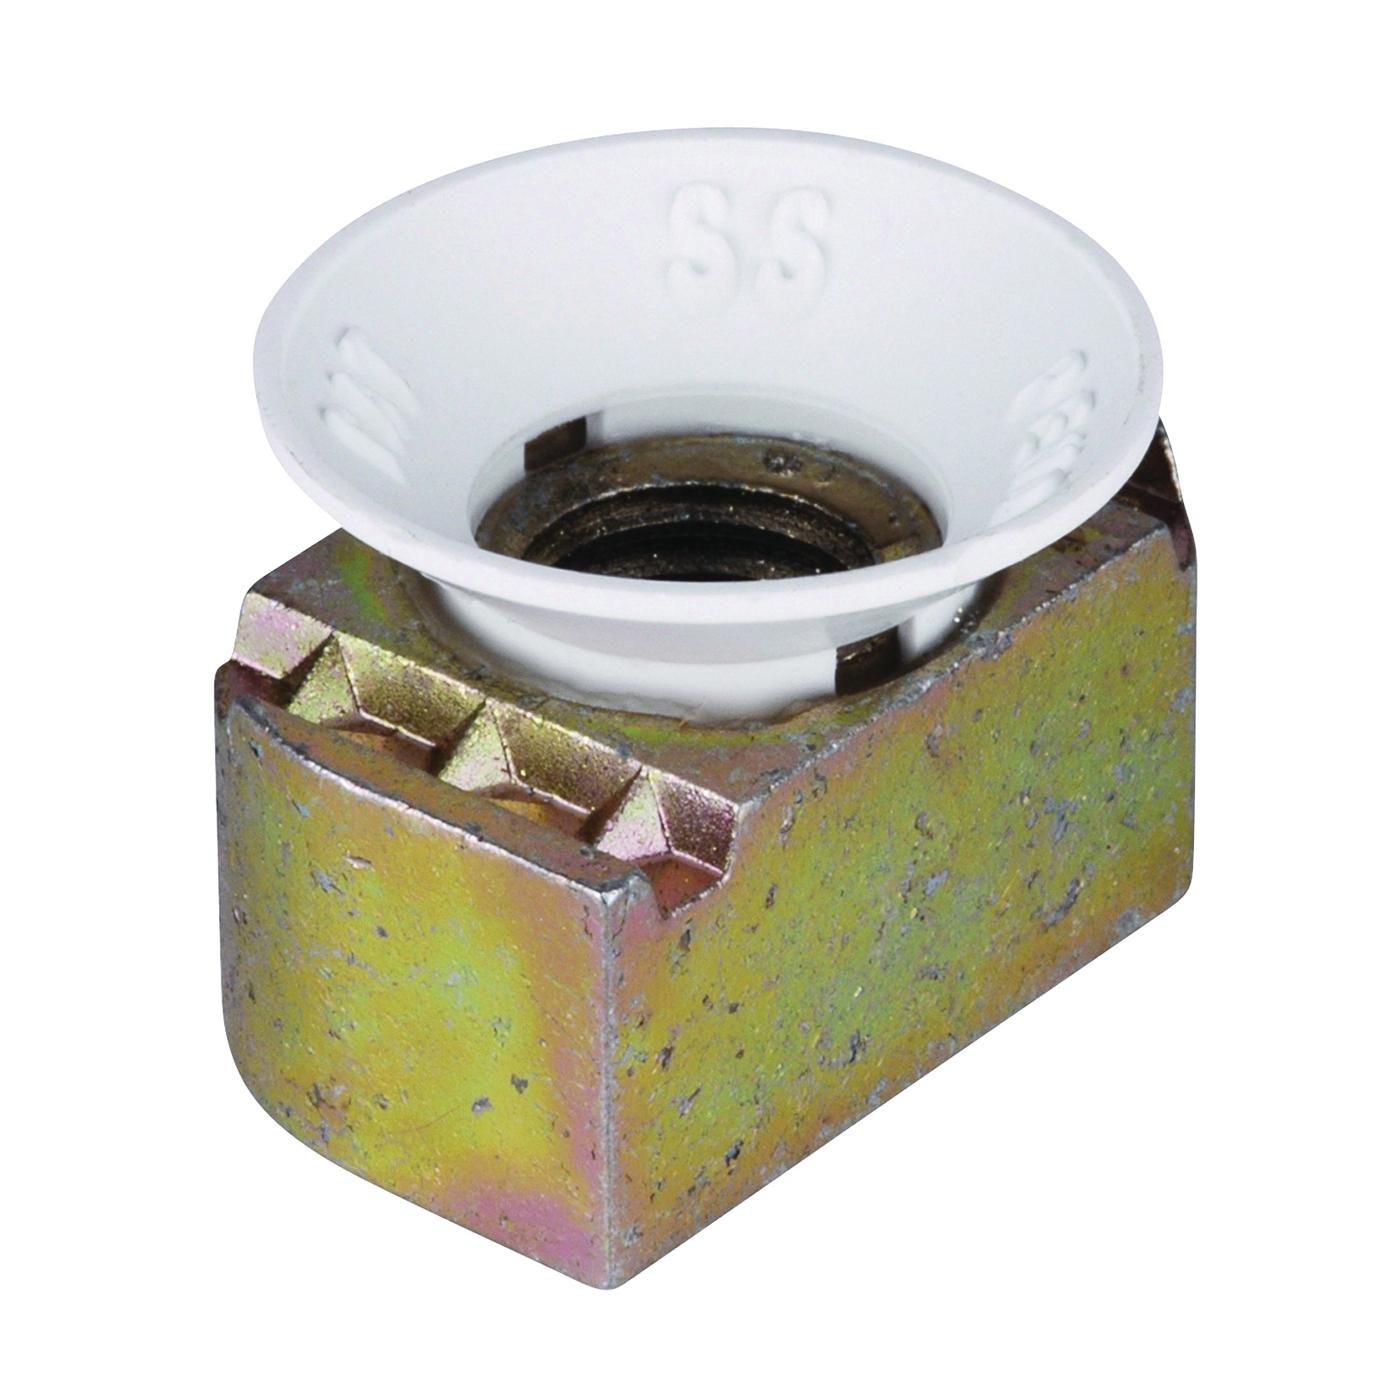 Picture of SuperStrut ZCM1003/8-10 Cone Nut, Nylon/Steel, Gold, Galvanized